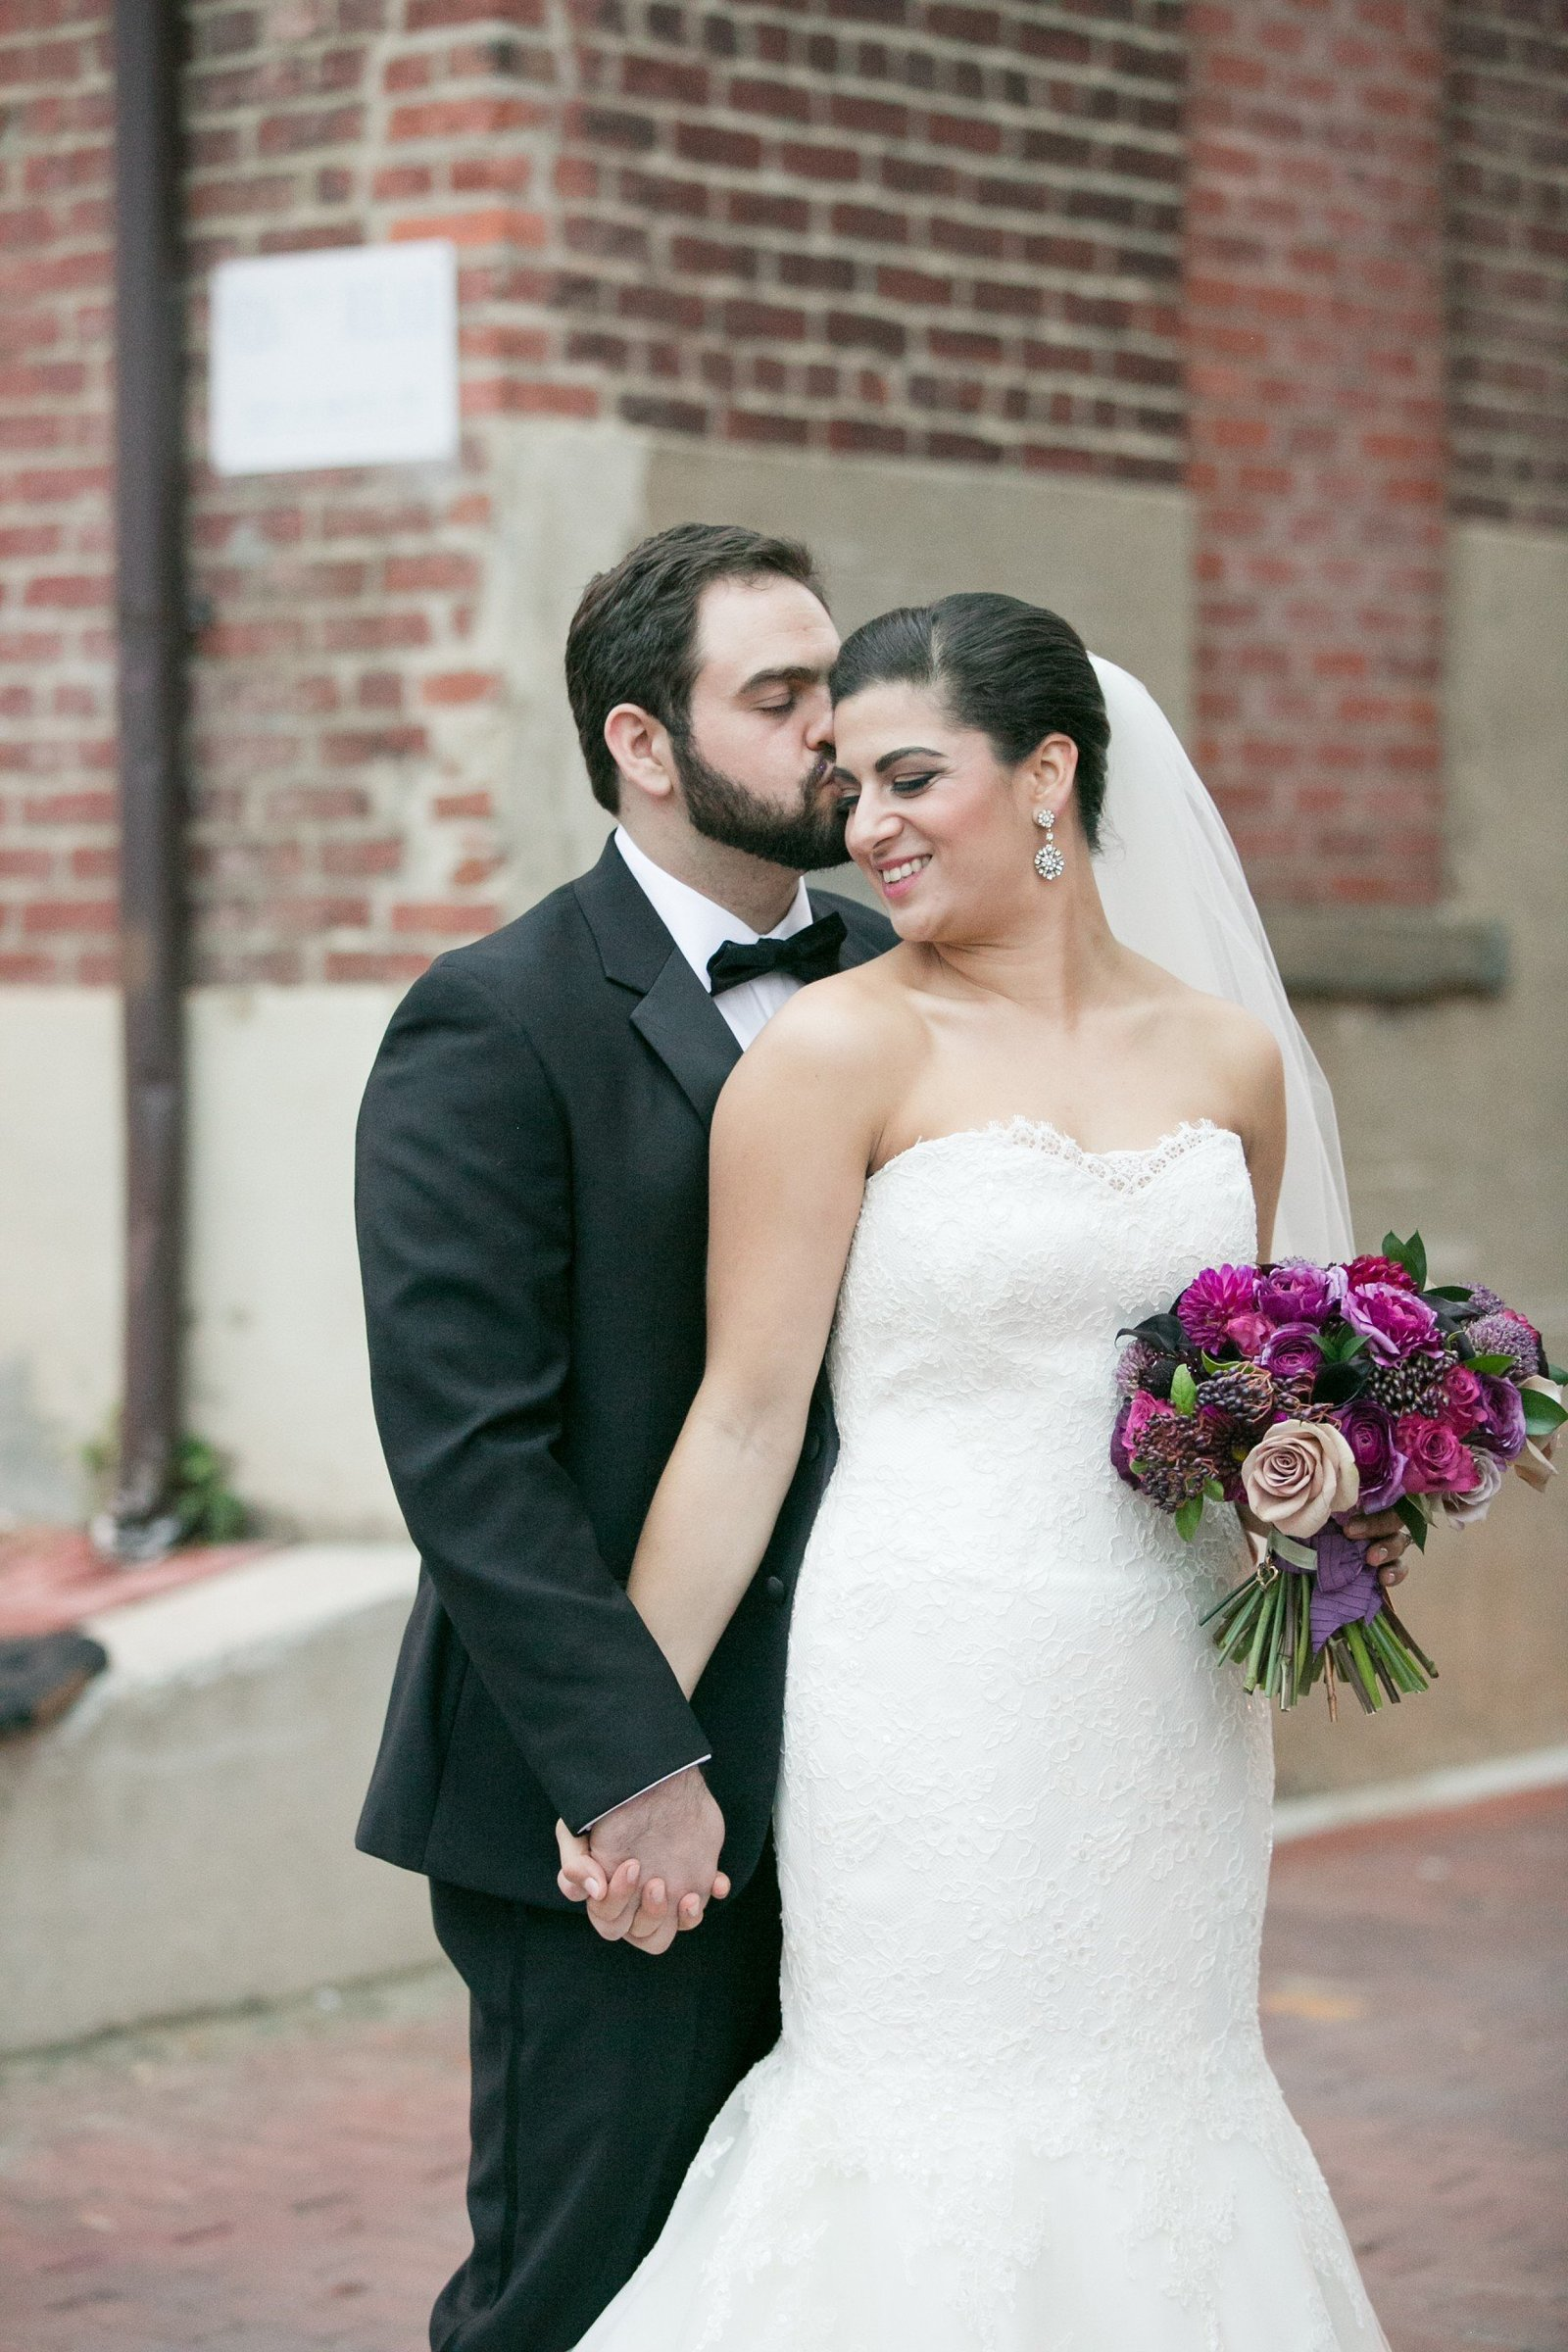 Black-tie-wedding-photos-longview-gallery-dc (176)